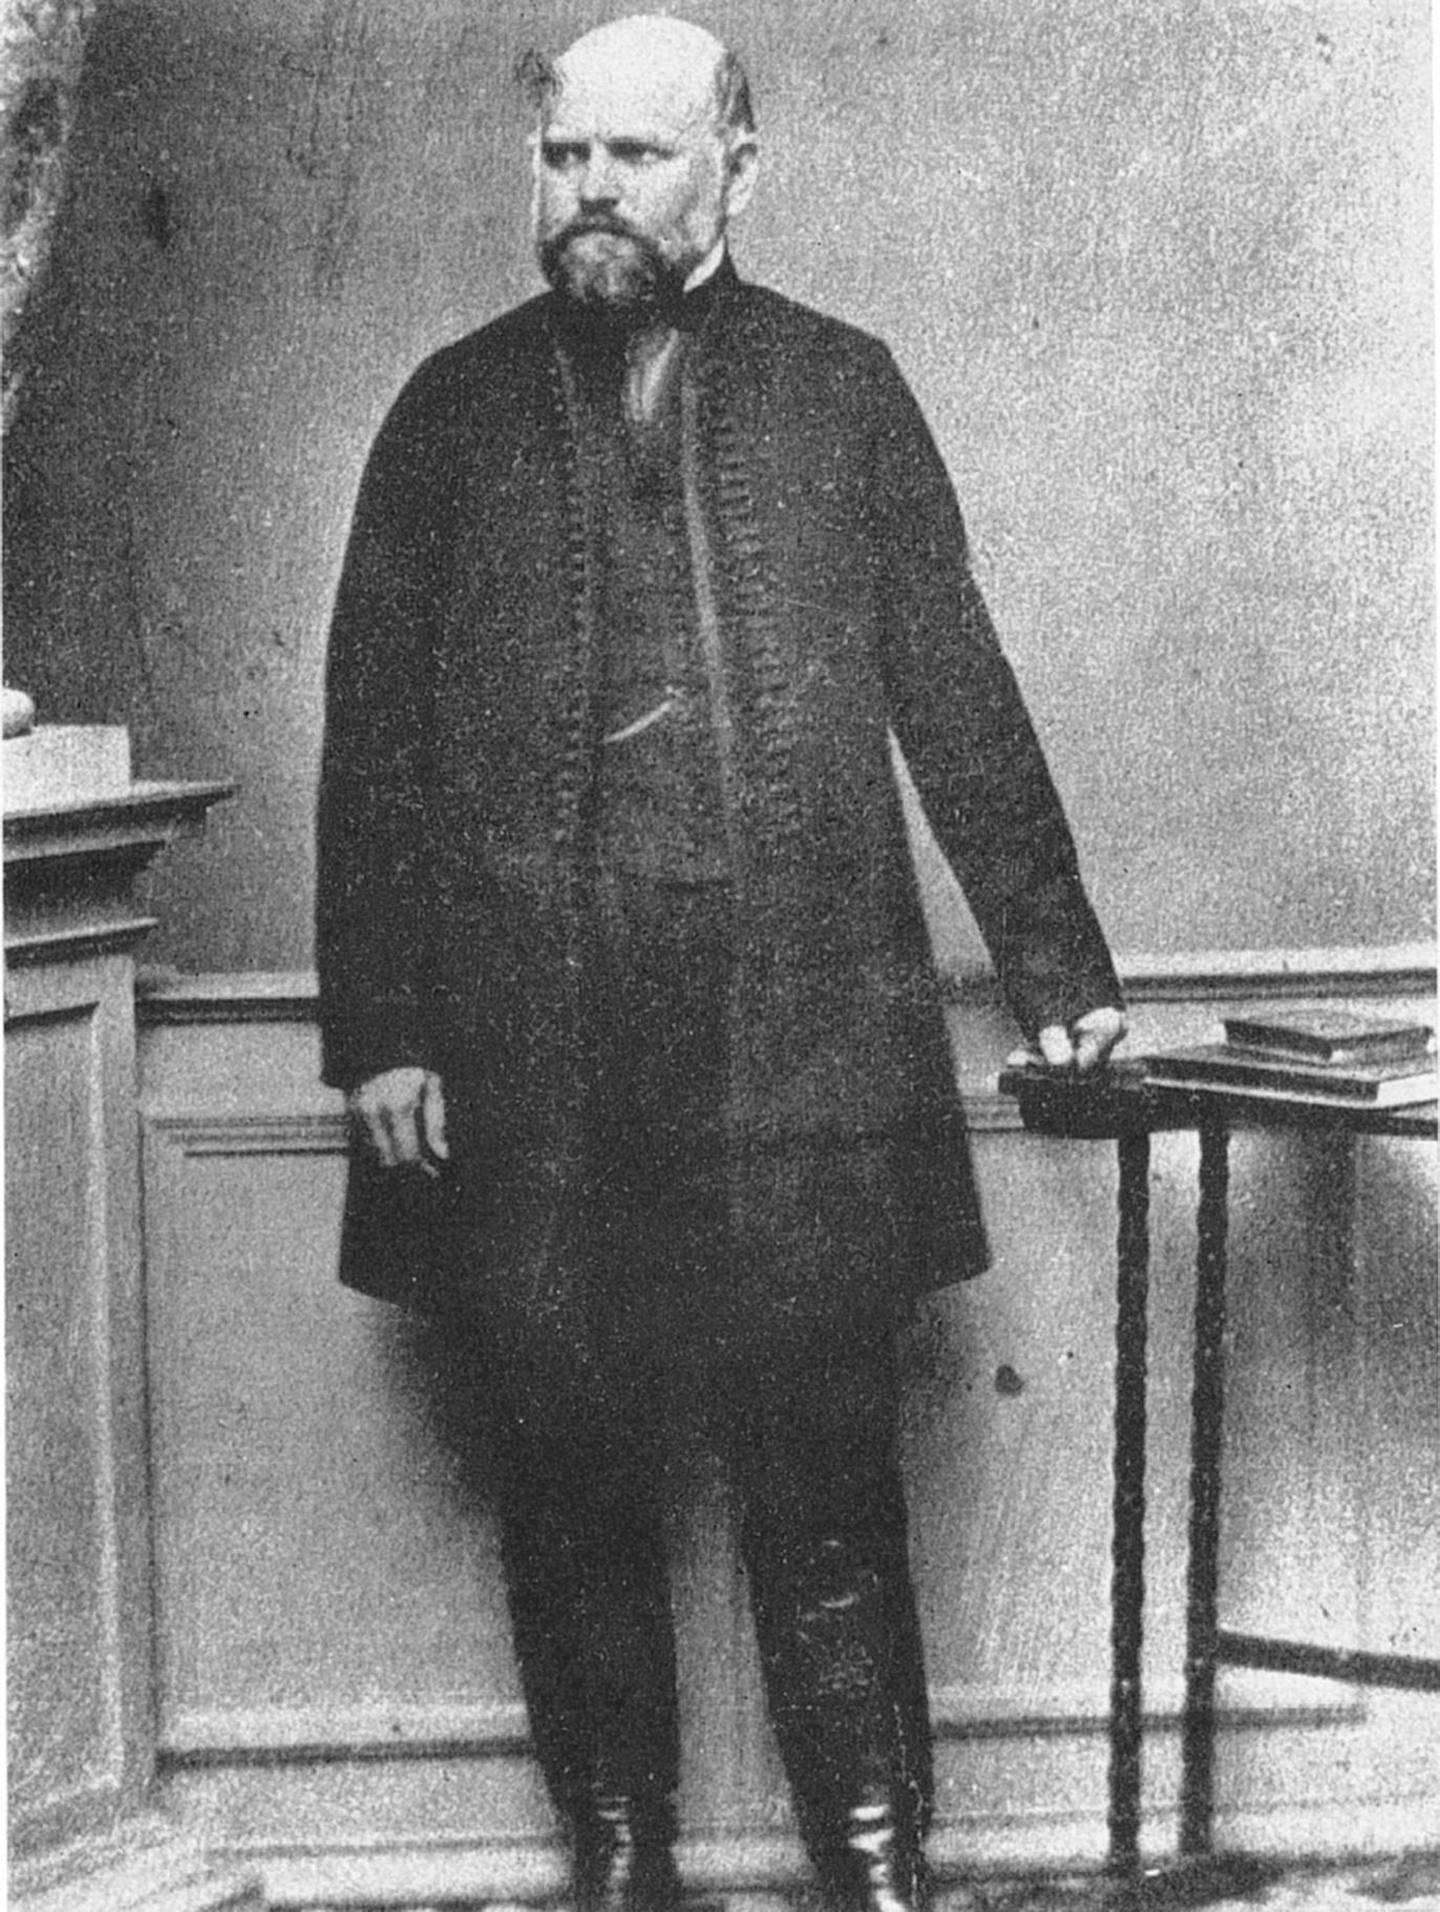 HKF7Y7 Ignaz Semmelweis 1863 last image